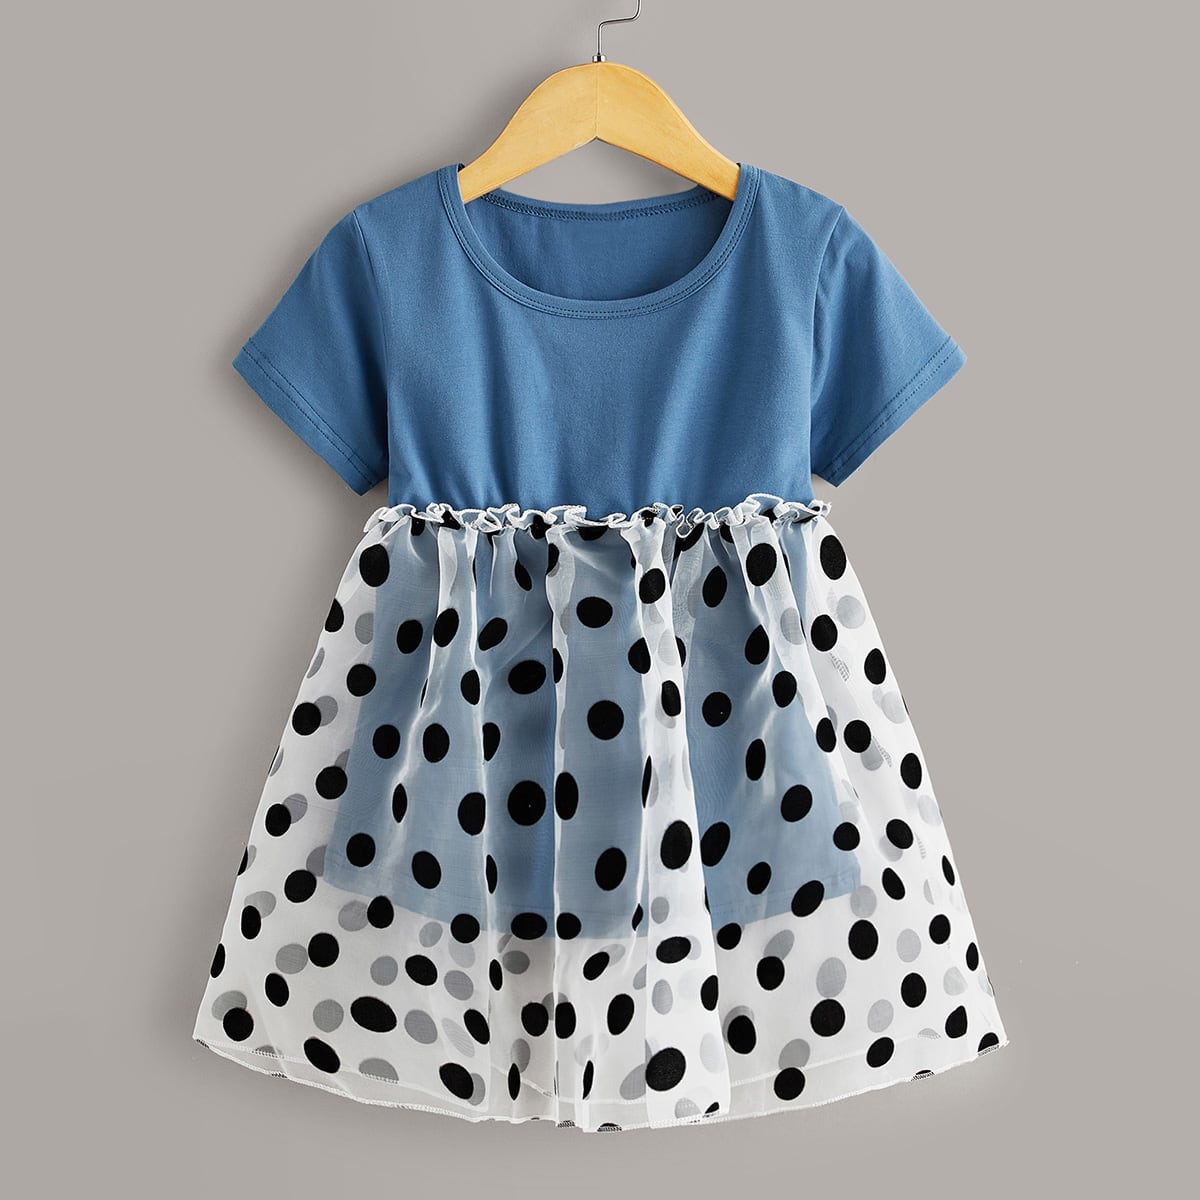 SHEIN / Toddler Girls Dobby Mesh Panel Frill A-line Dress